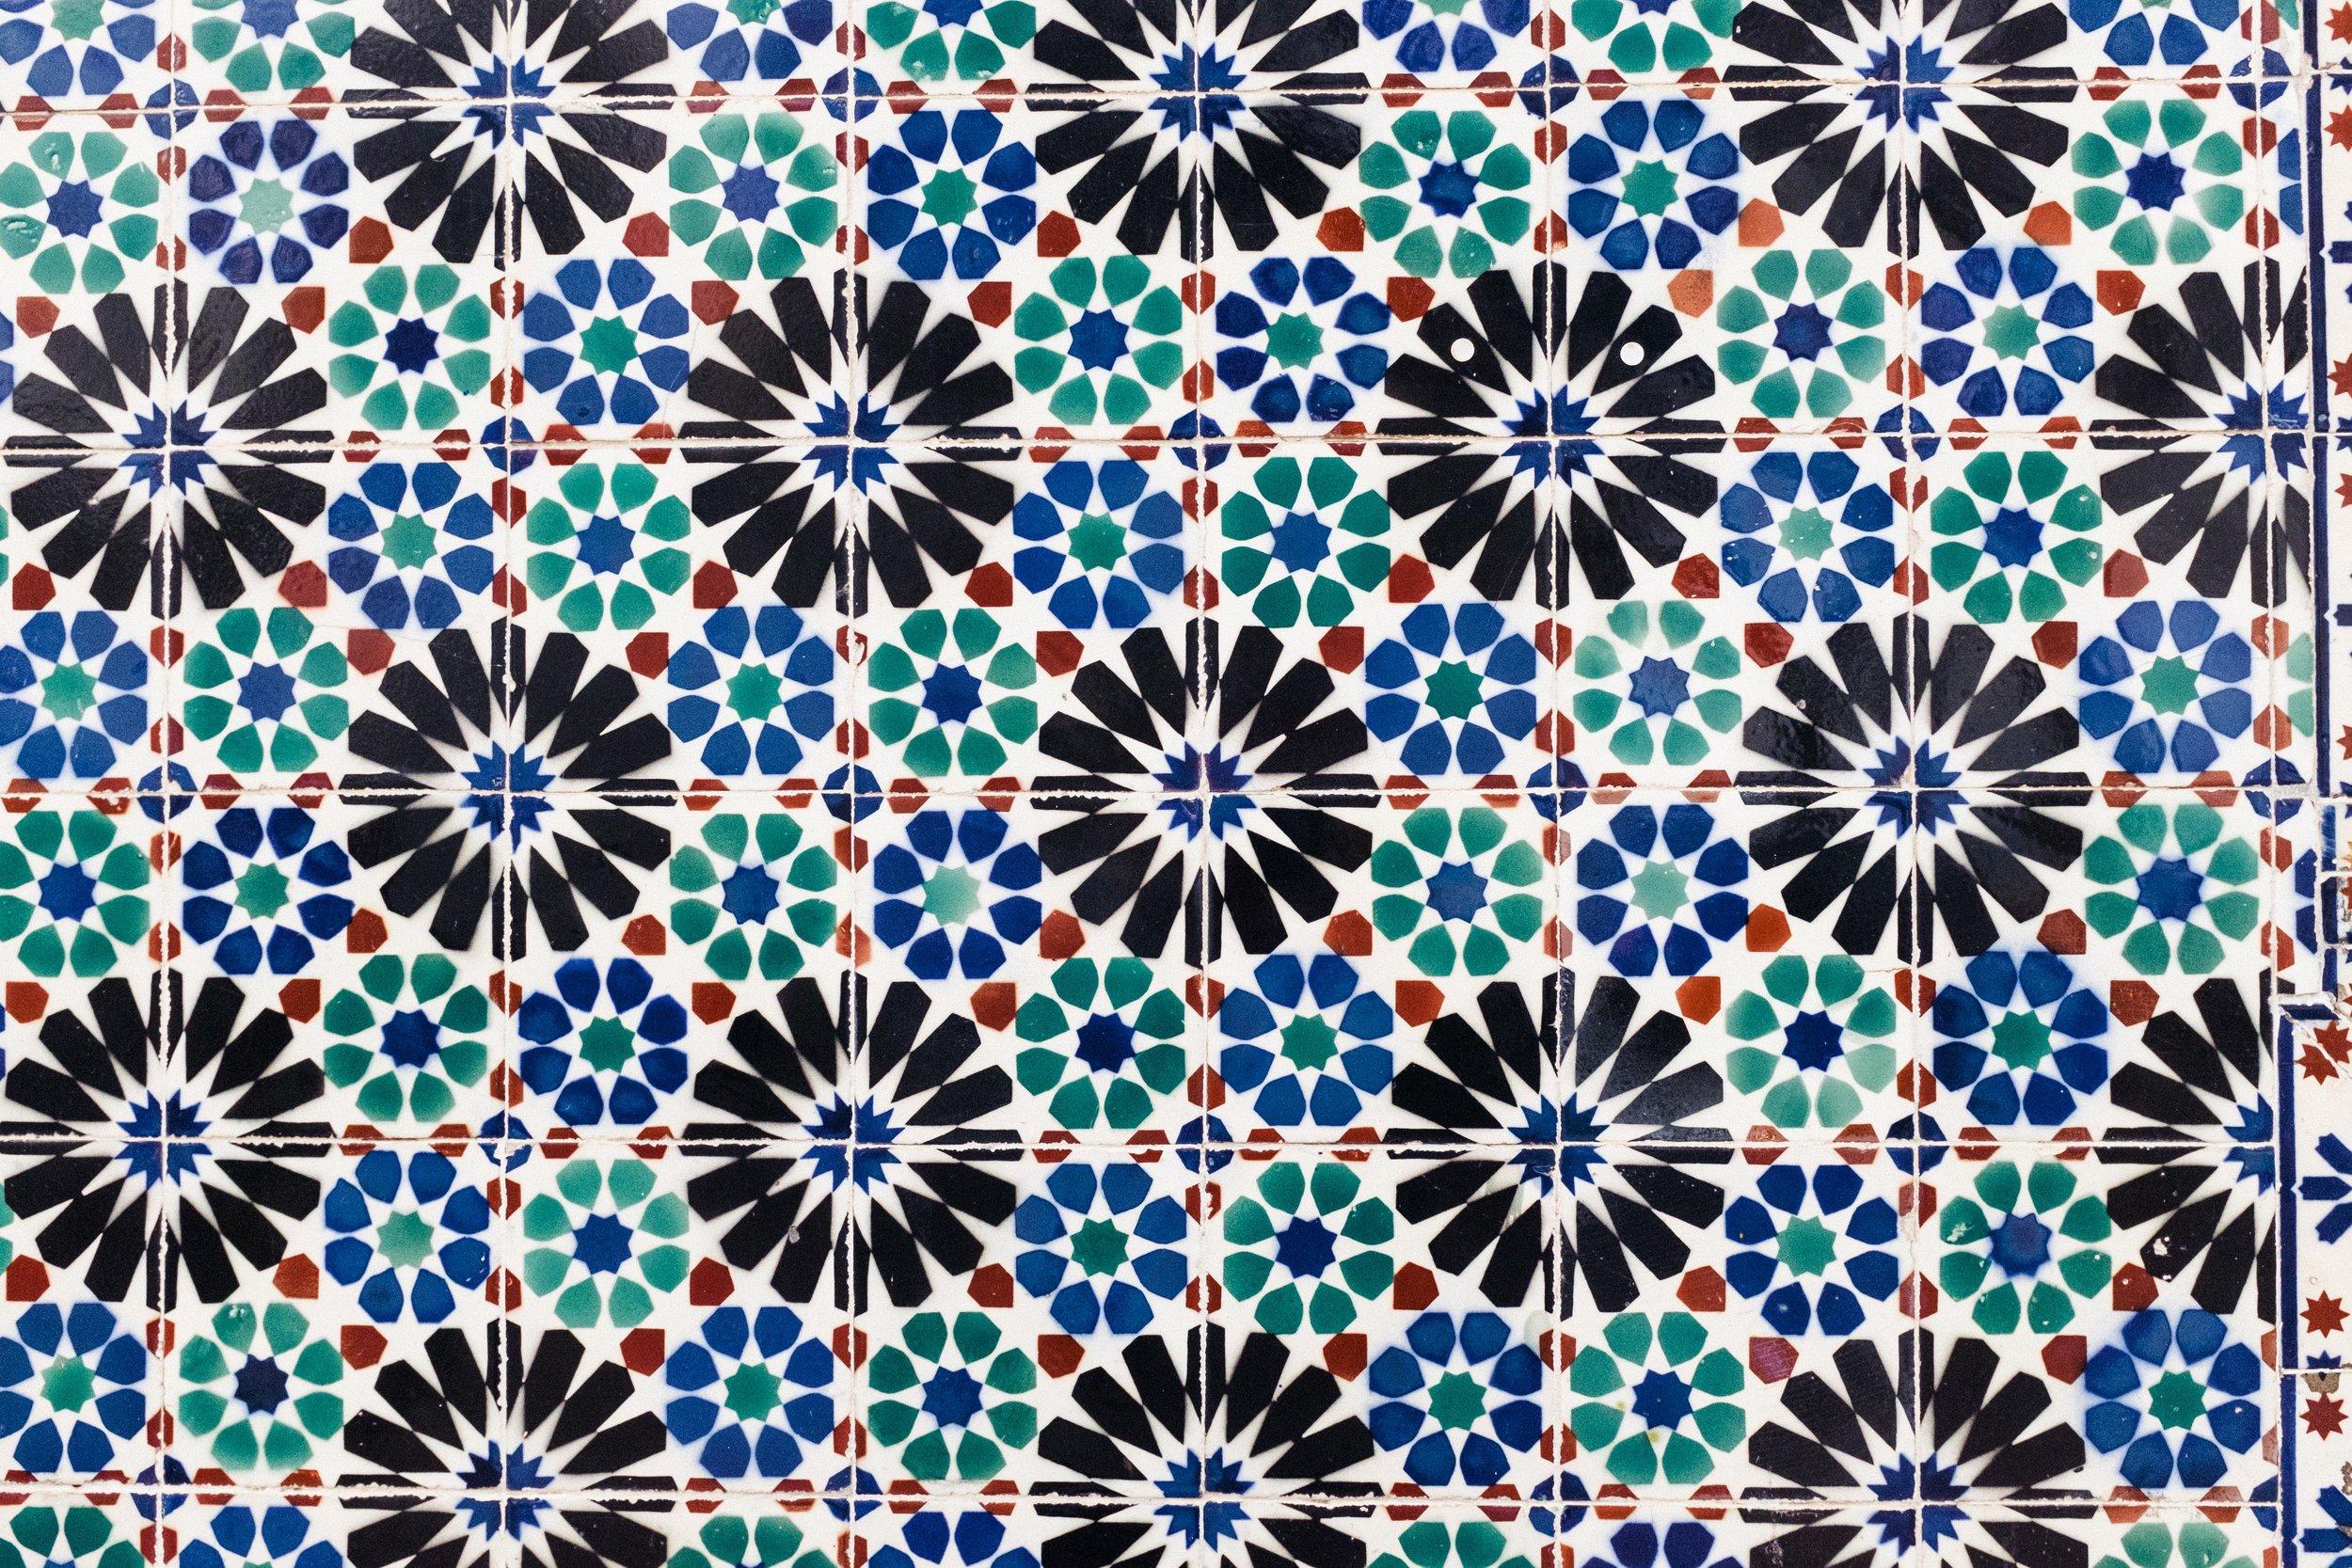 lisbon-portugal-azulejos-tiles-blue-green-black